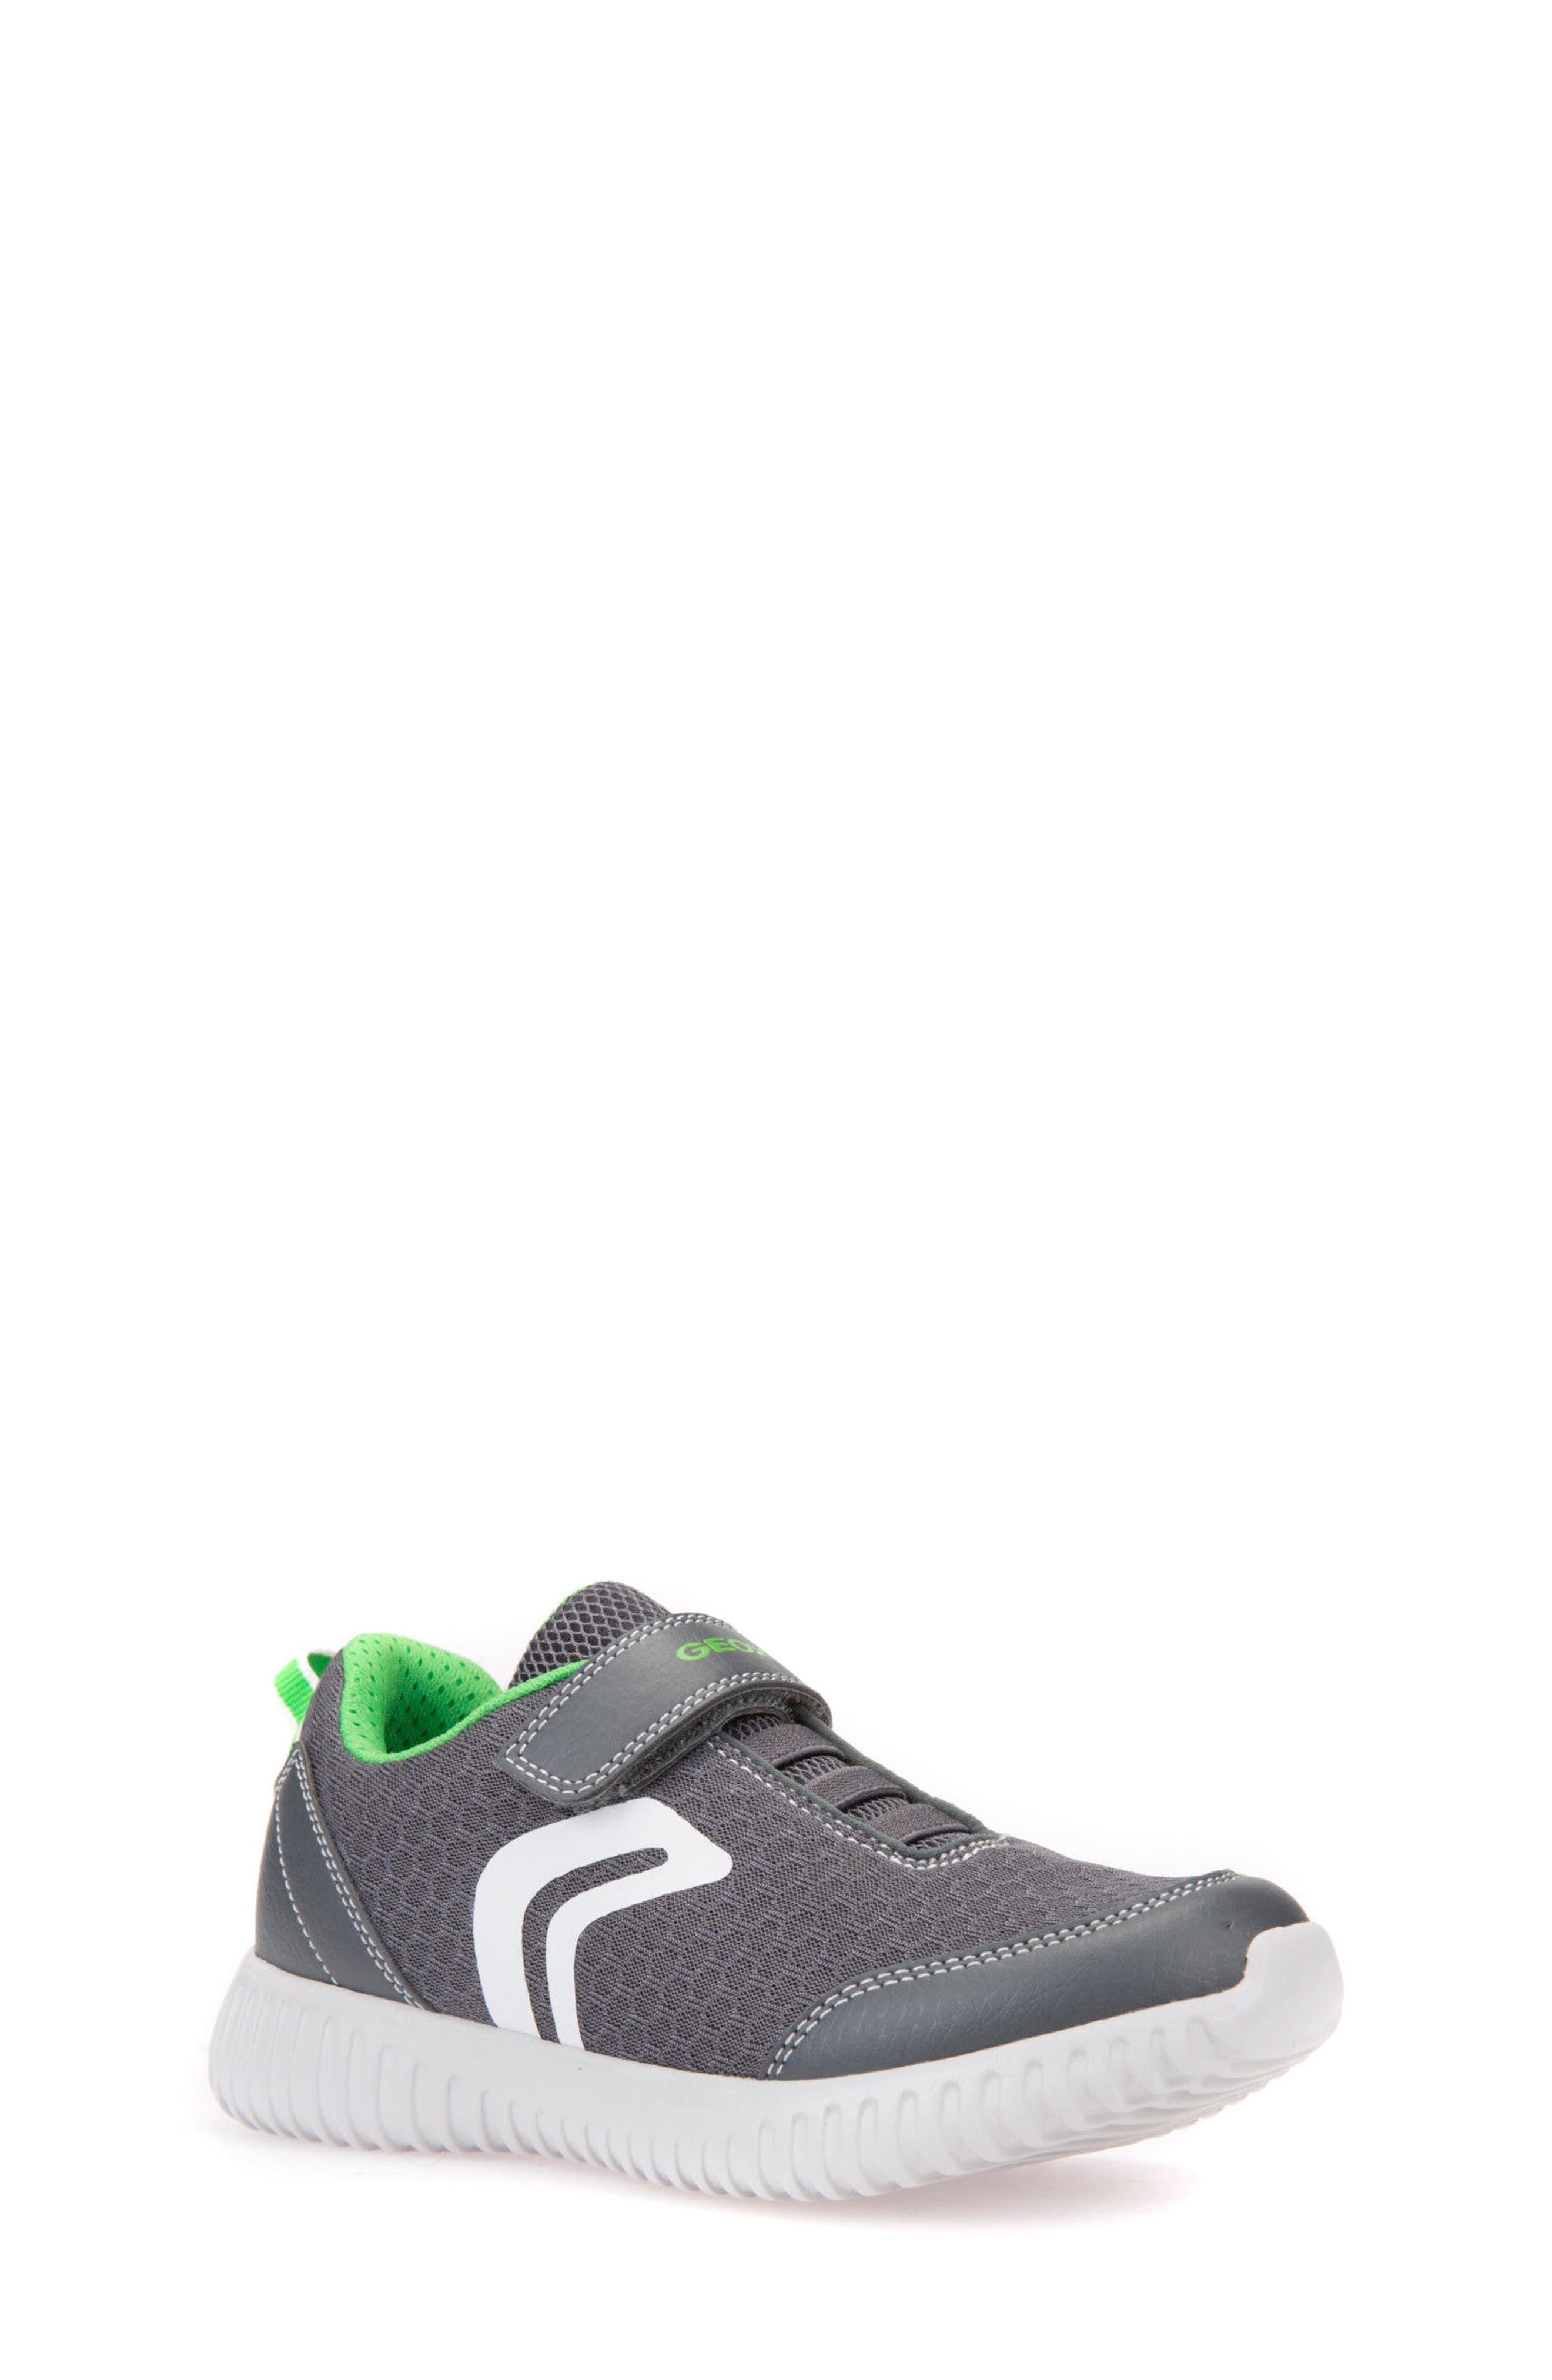 Main Image - Geox Waviness Sneaker (Toddler, Little Kid & Big Kid)